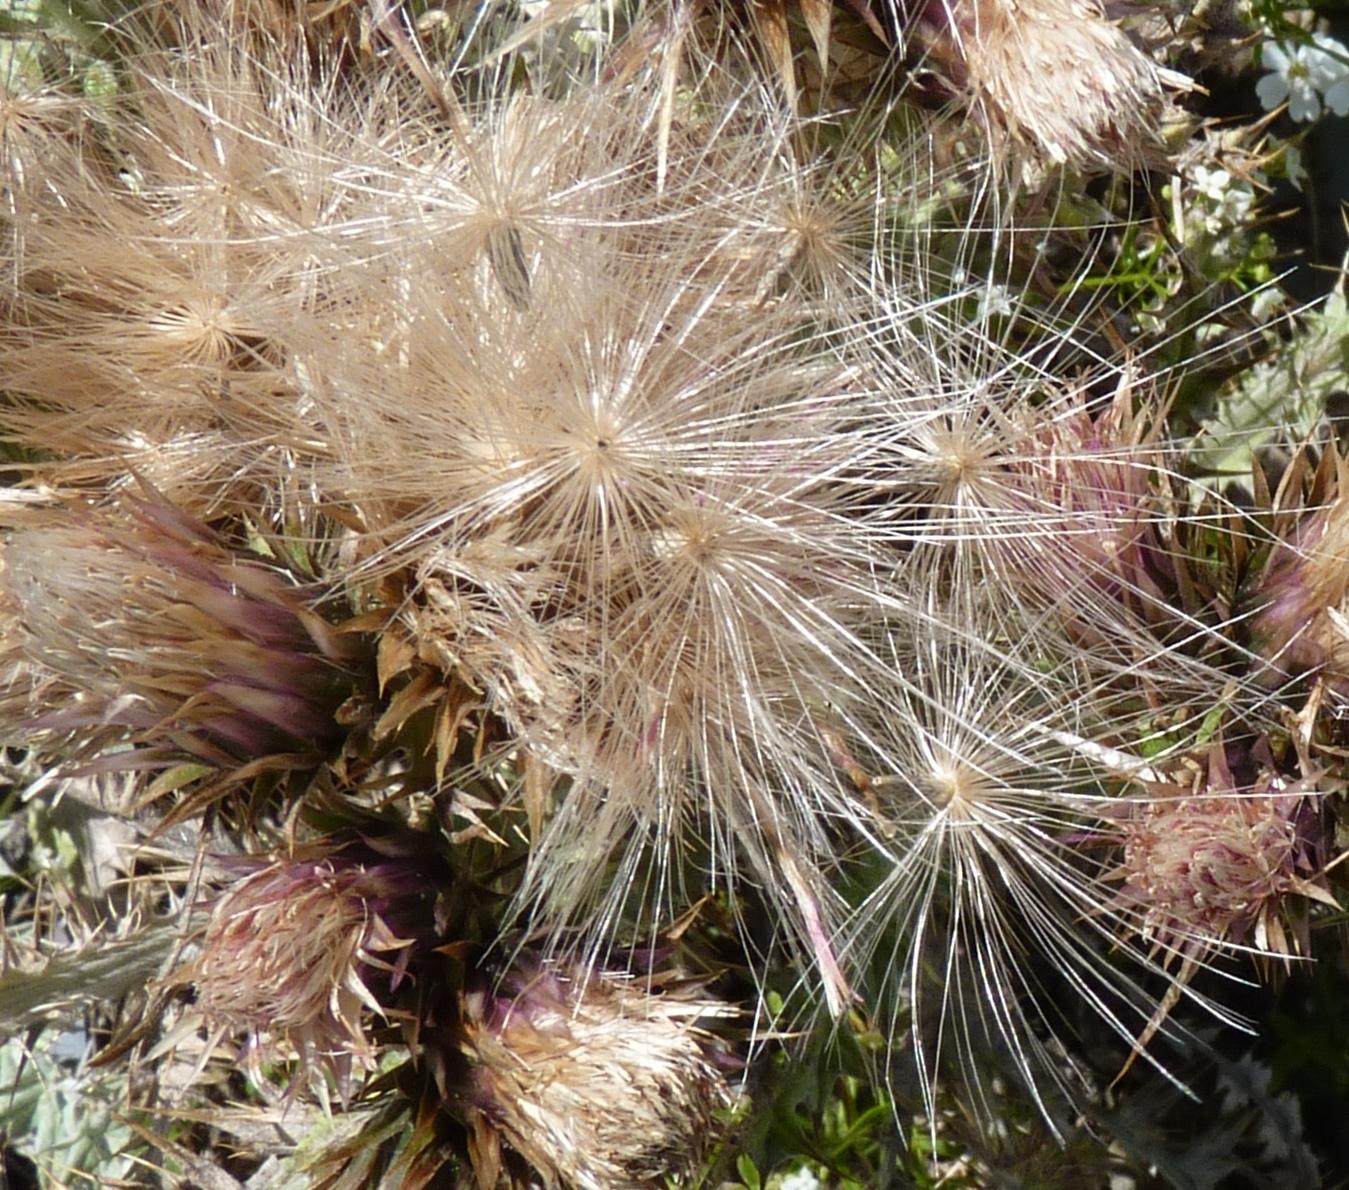 http://api.tela-botanica.org/img:000255171O.jpg